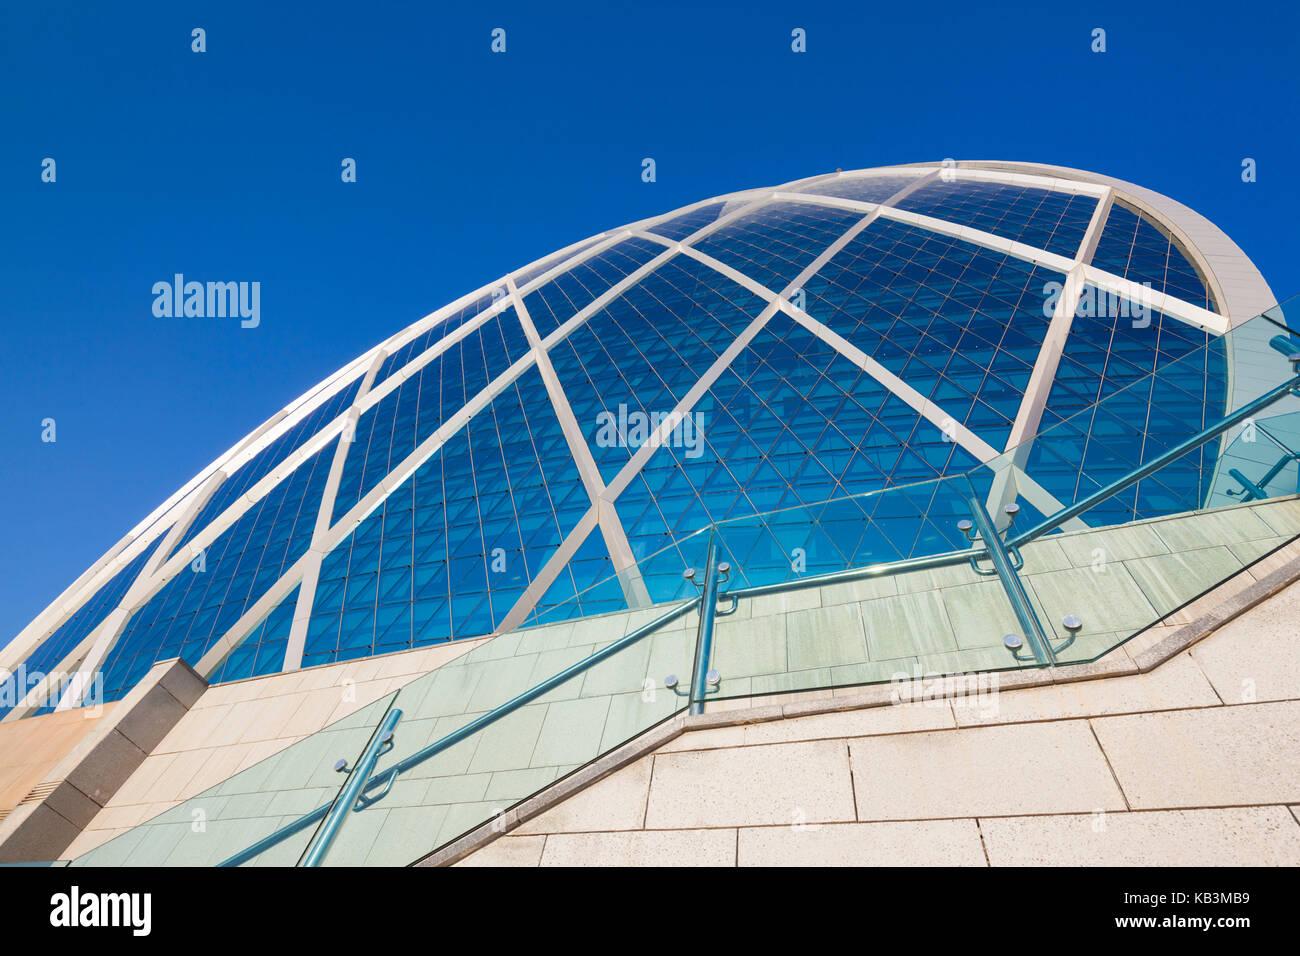 UAE, Abu Dhabi, Al Raha Beach, circular office building, headquarters of the Aldar Company, real estate developers - Stock Image